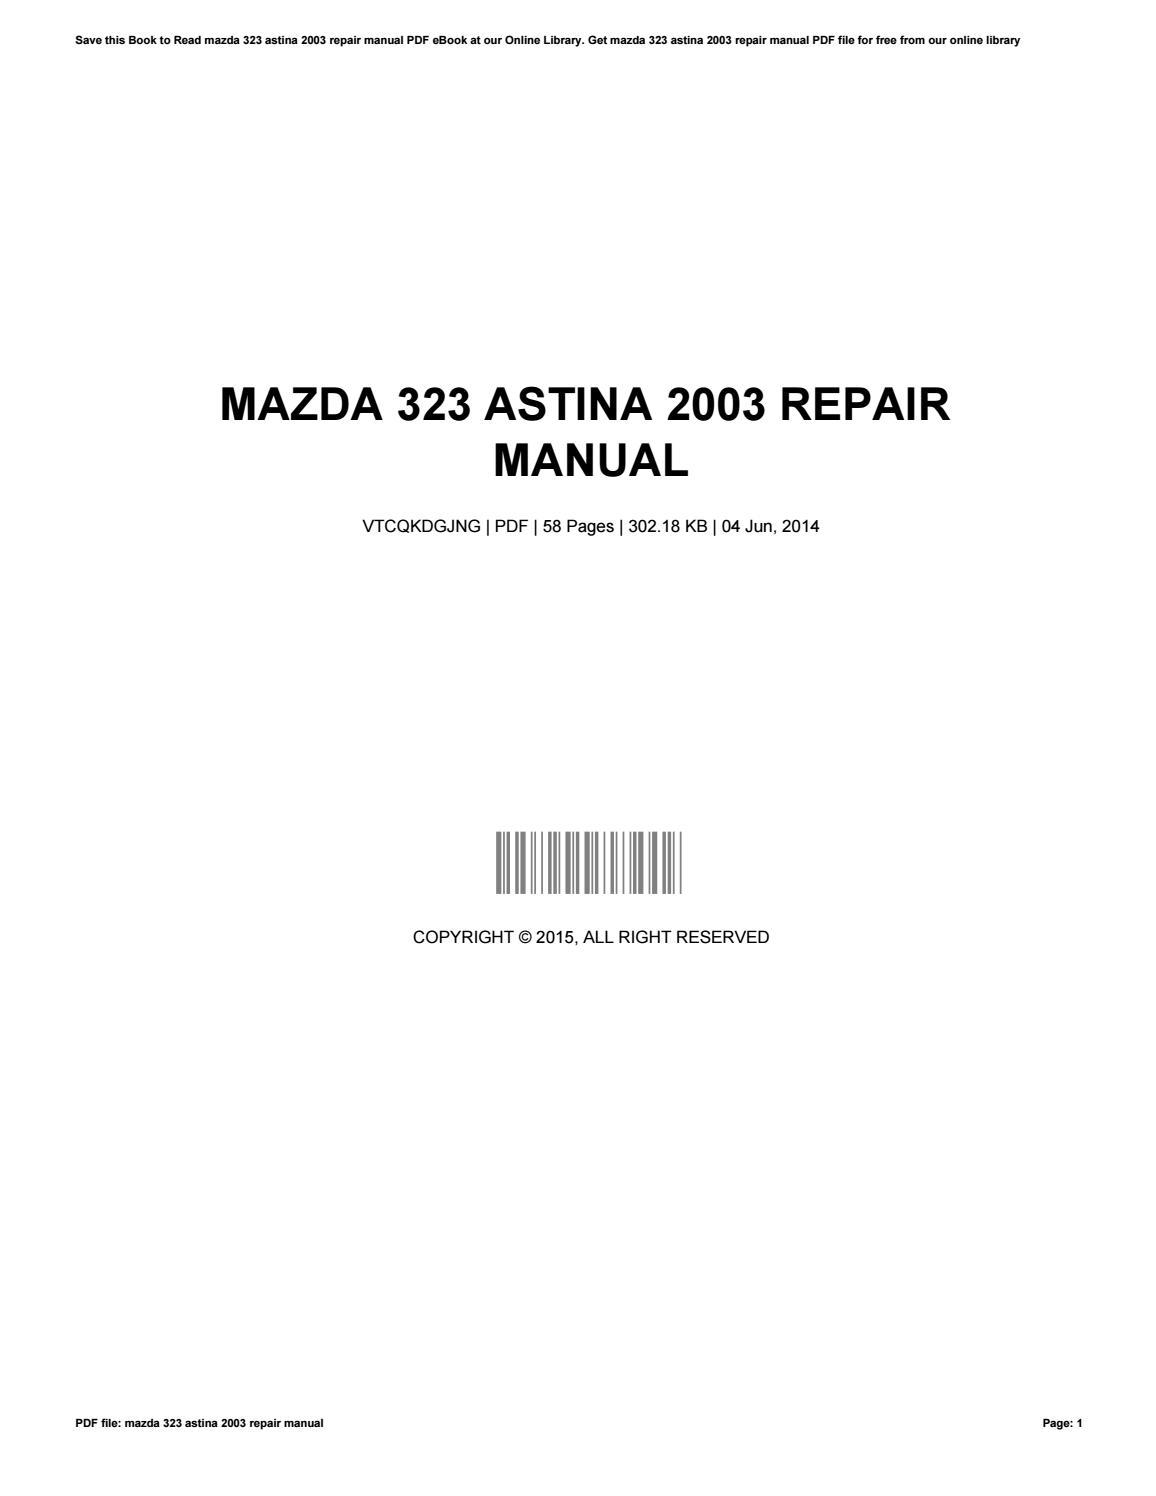 mazda 323 astina workshop manual pdf